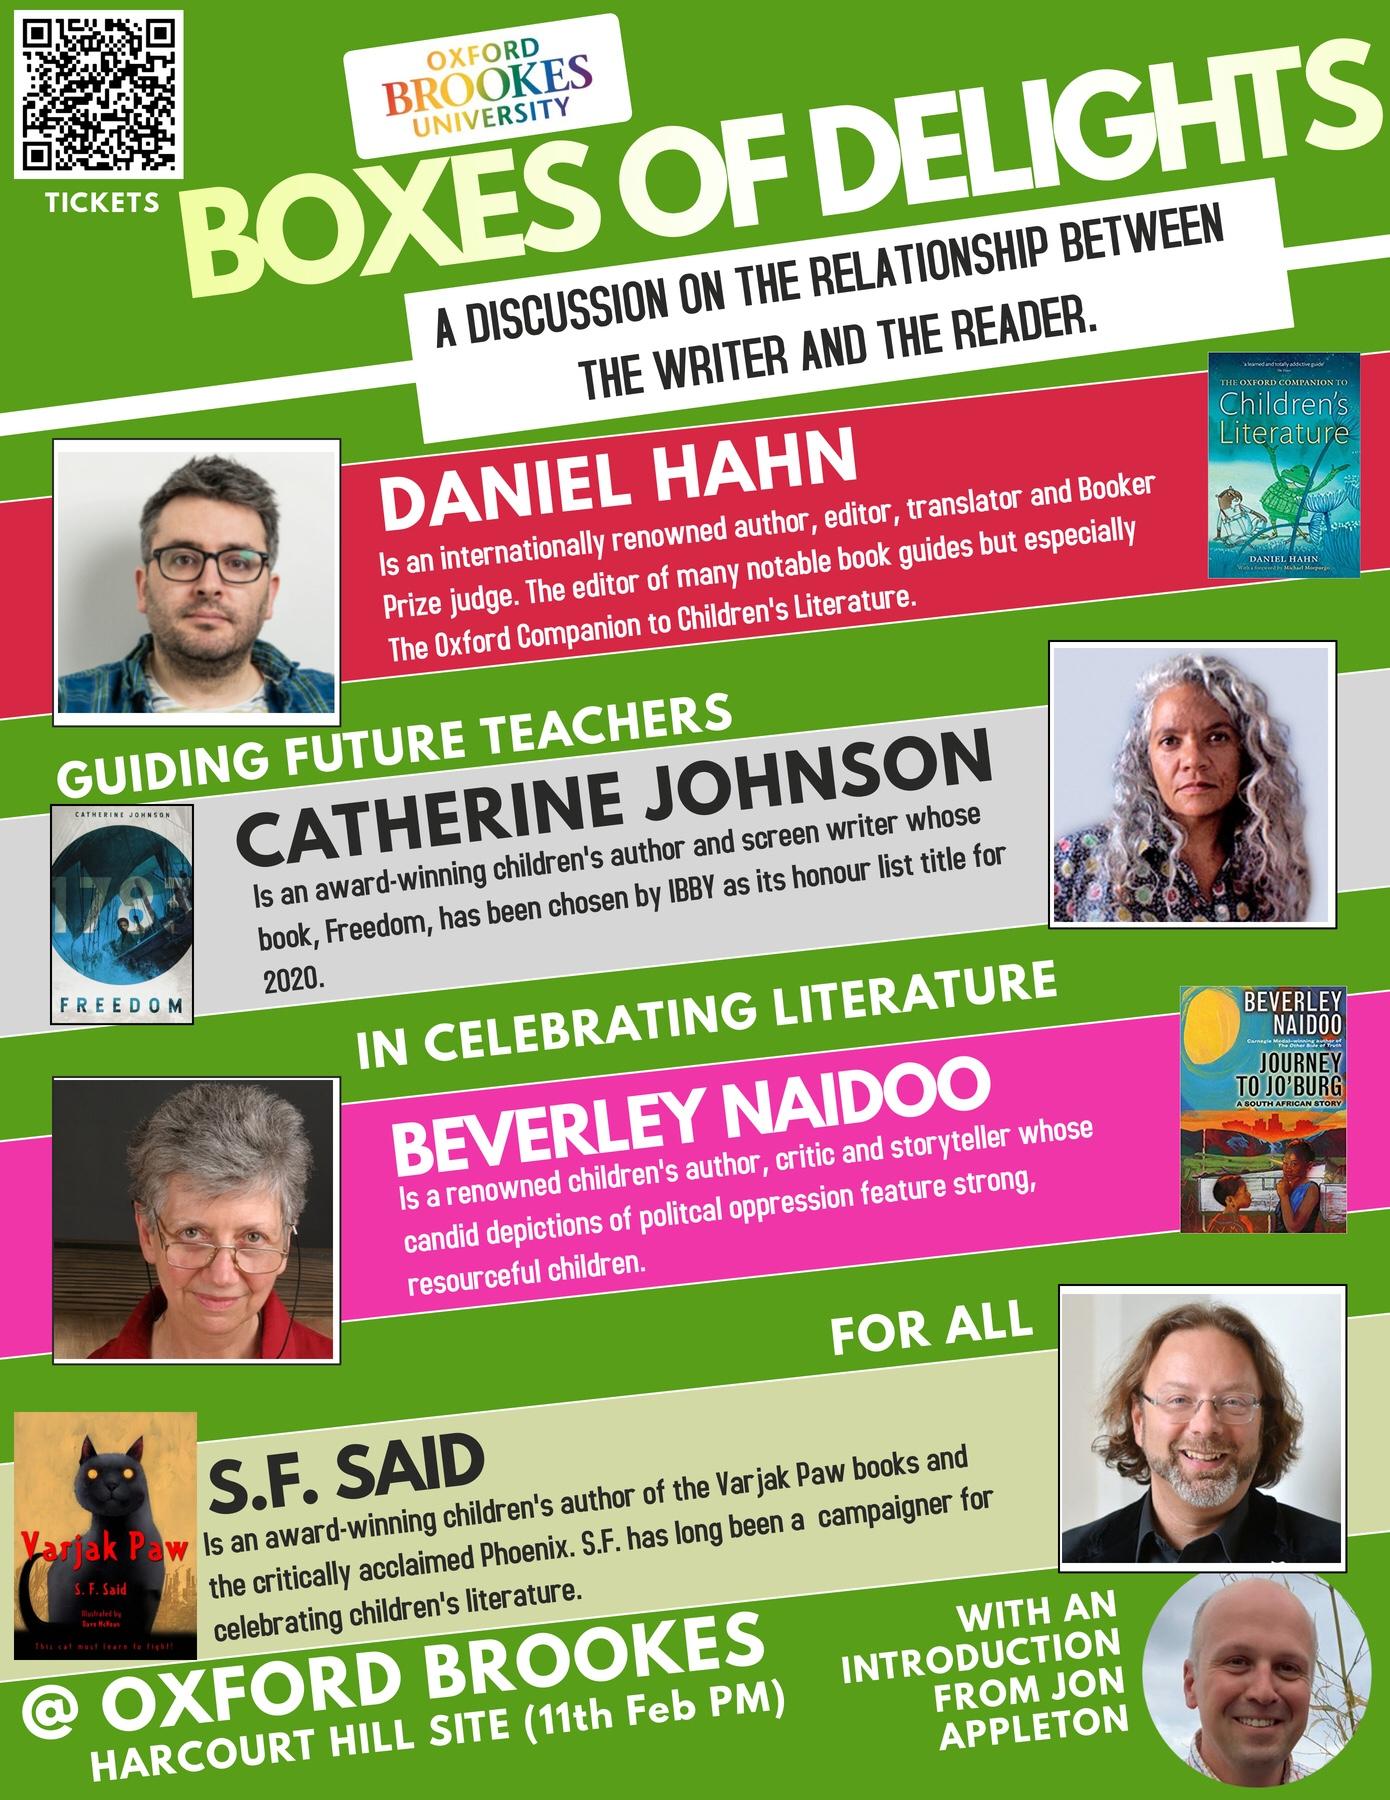 childrens literature conference (1)-1